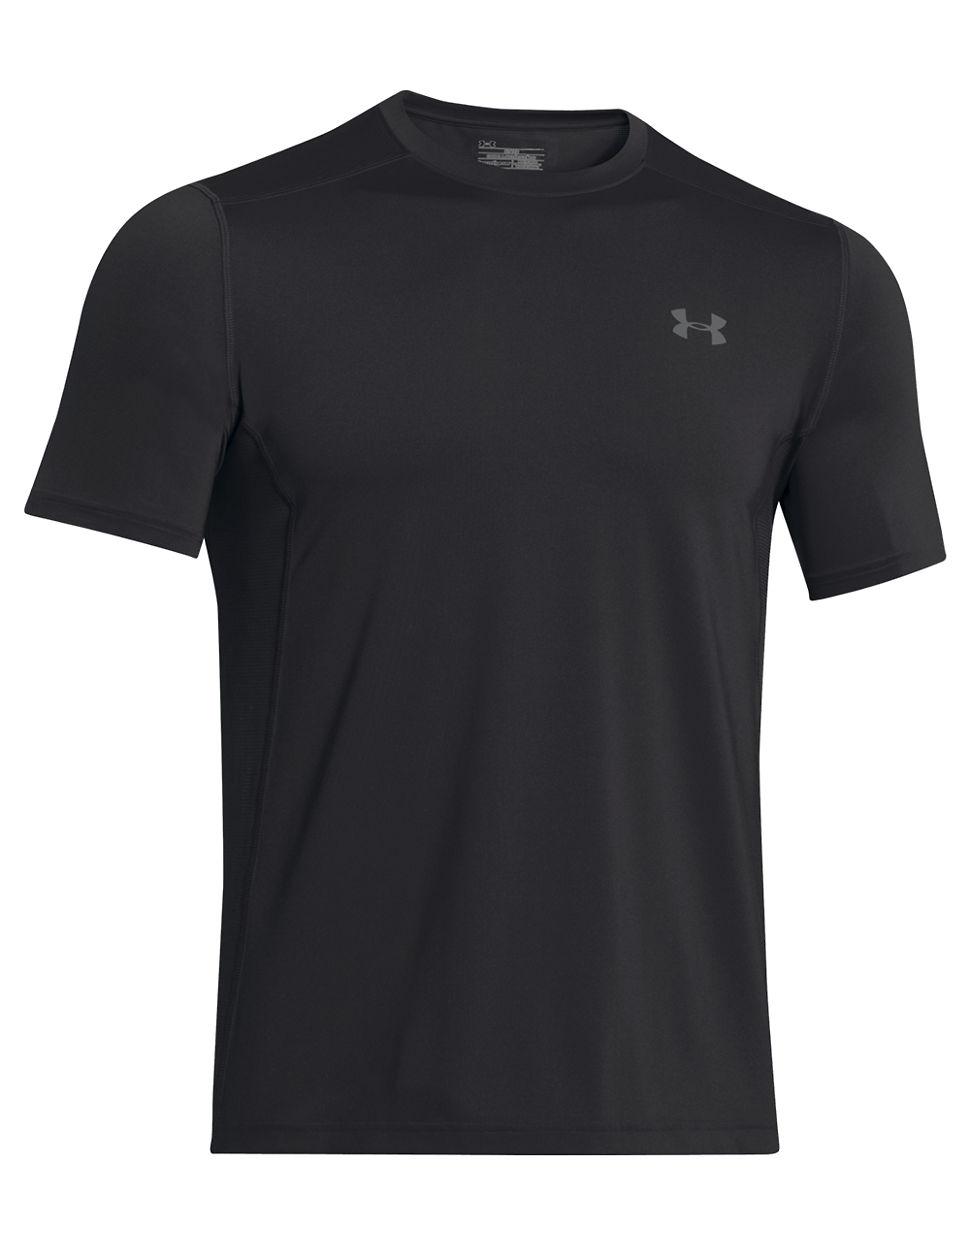 Under Armour Raid T Shirt In Black For Men Lyst